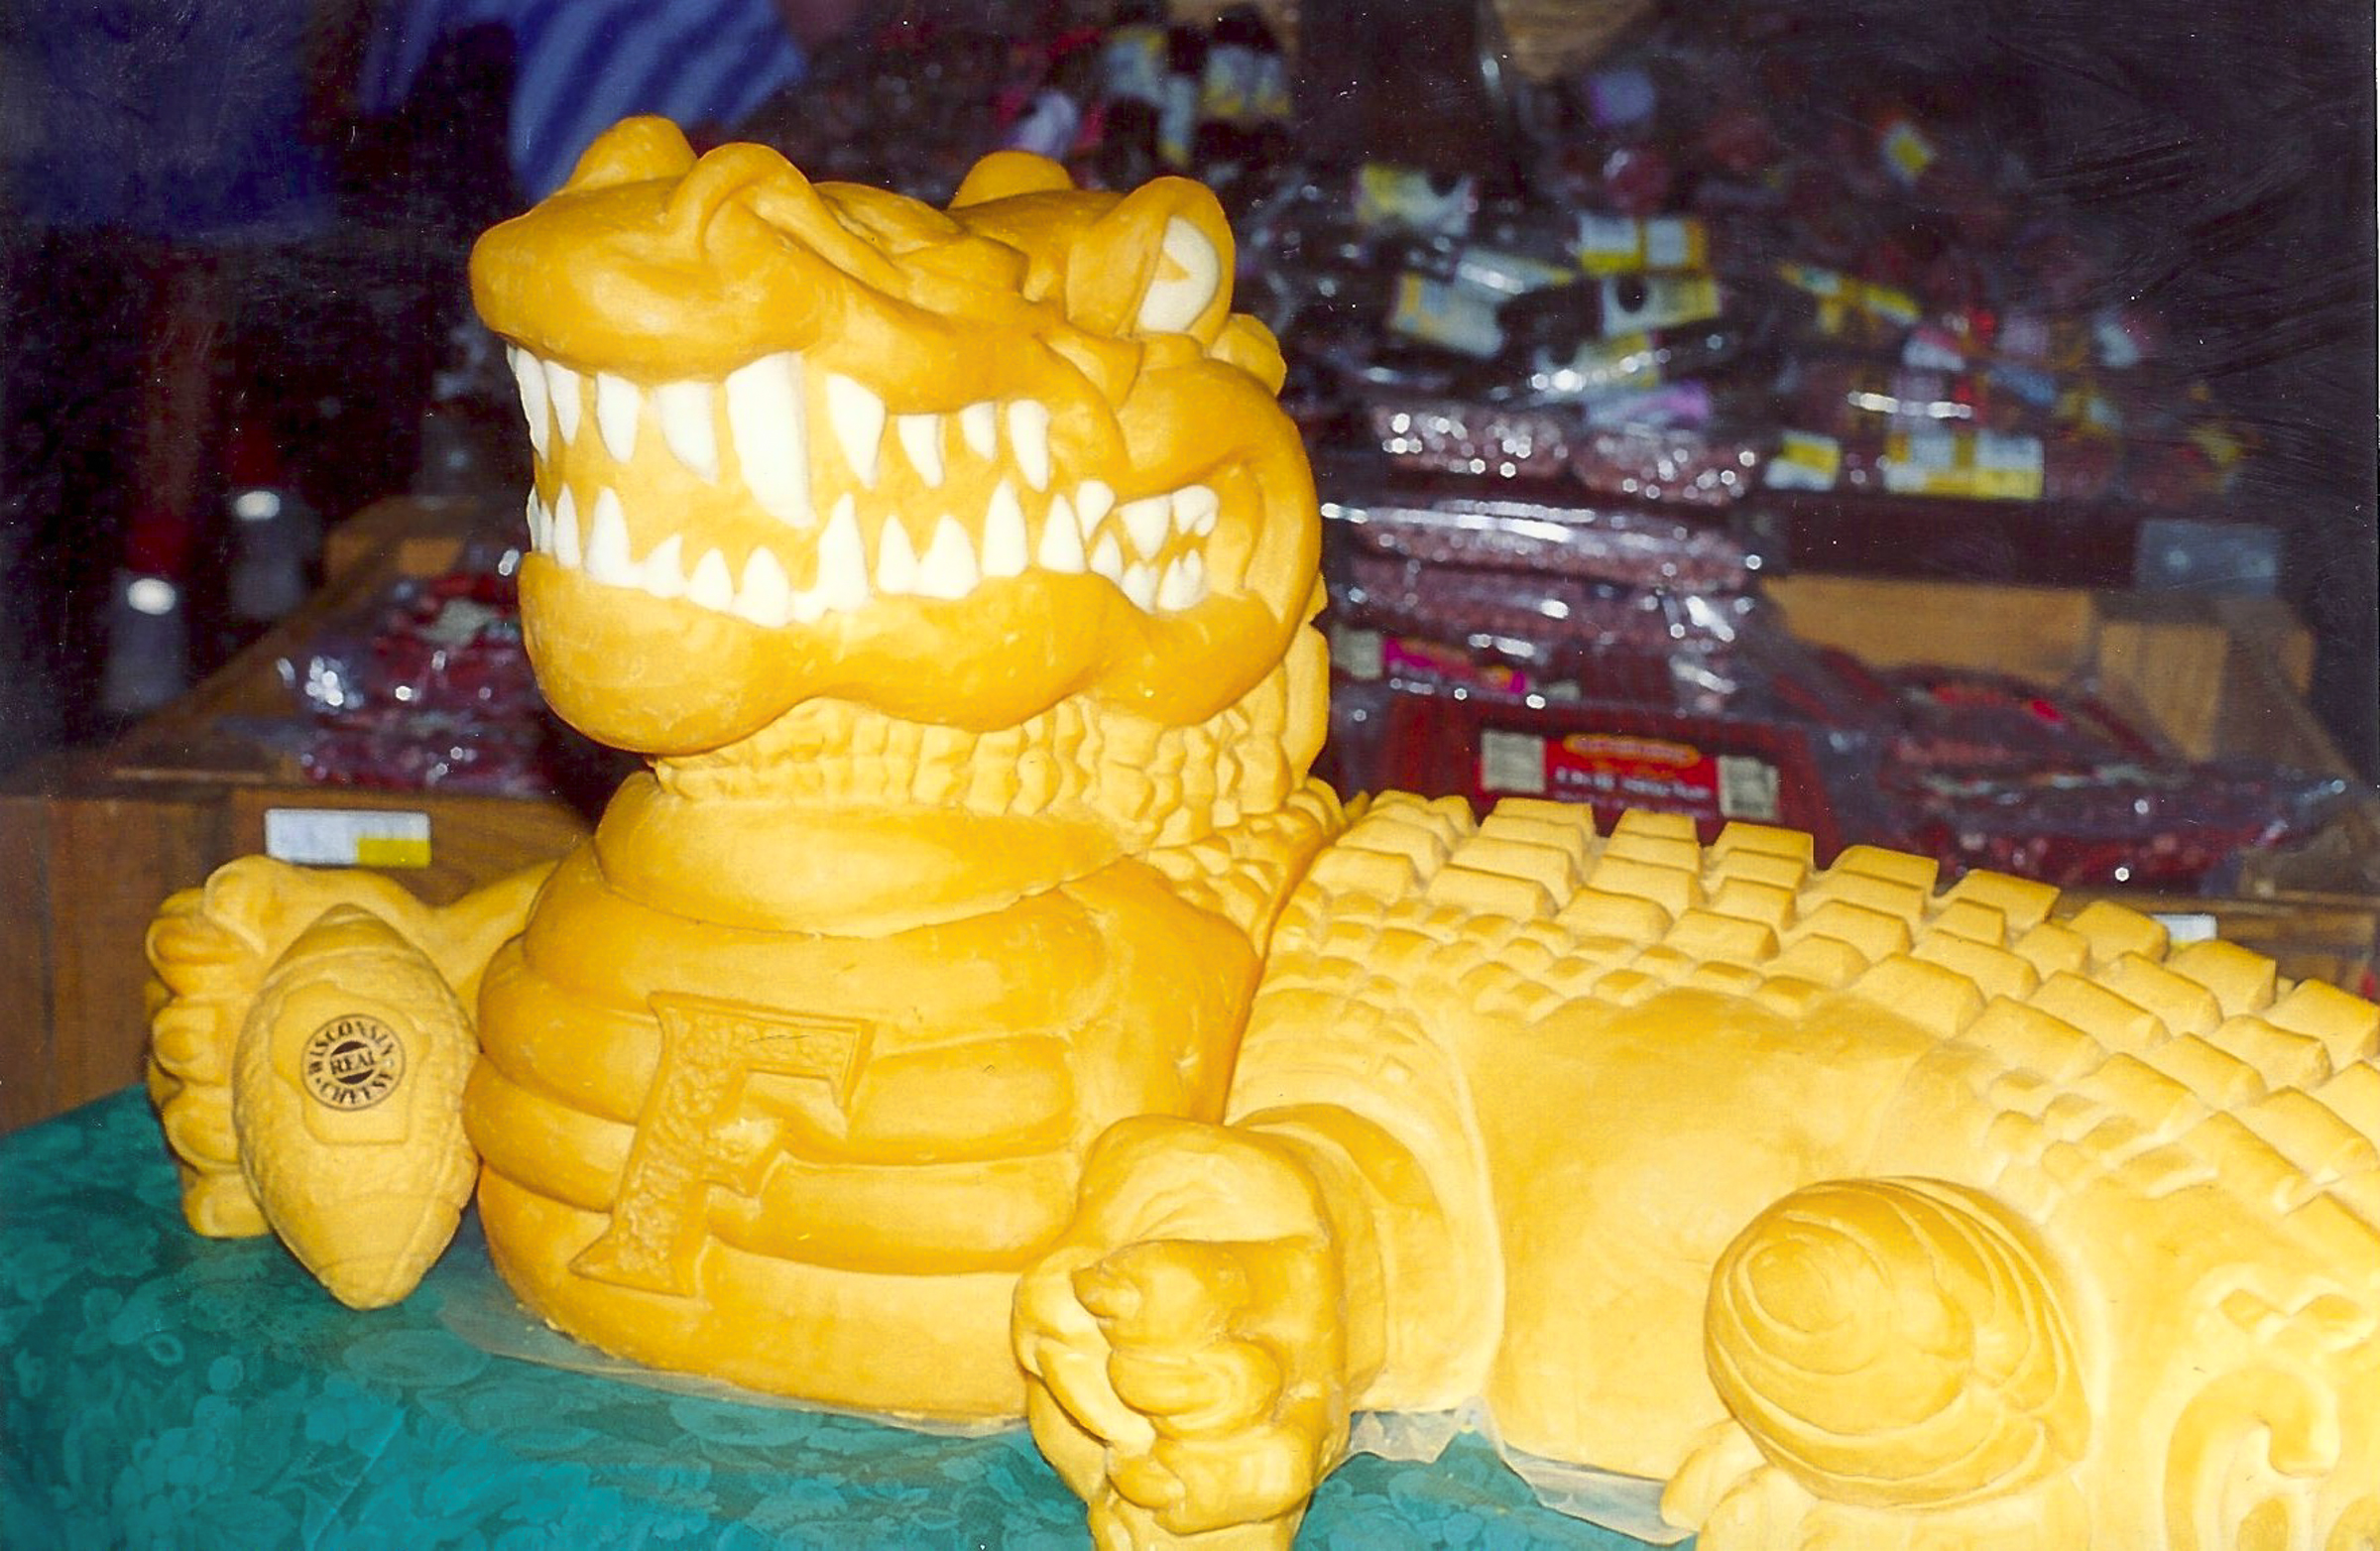 CG_Cheese_Gator